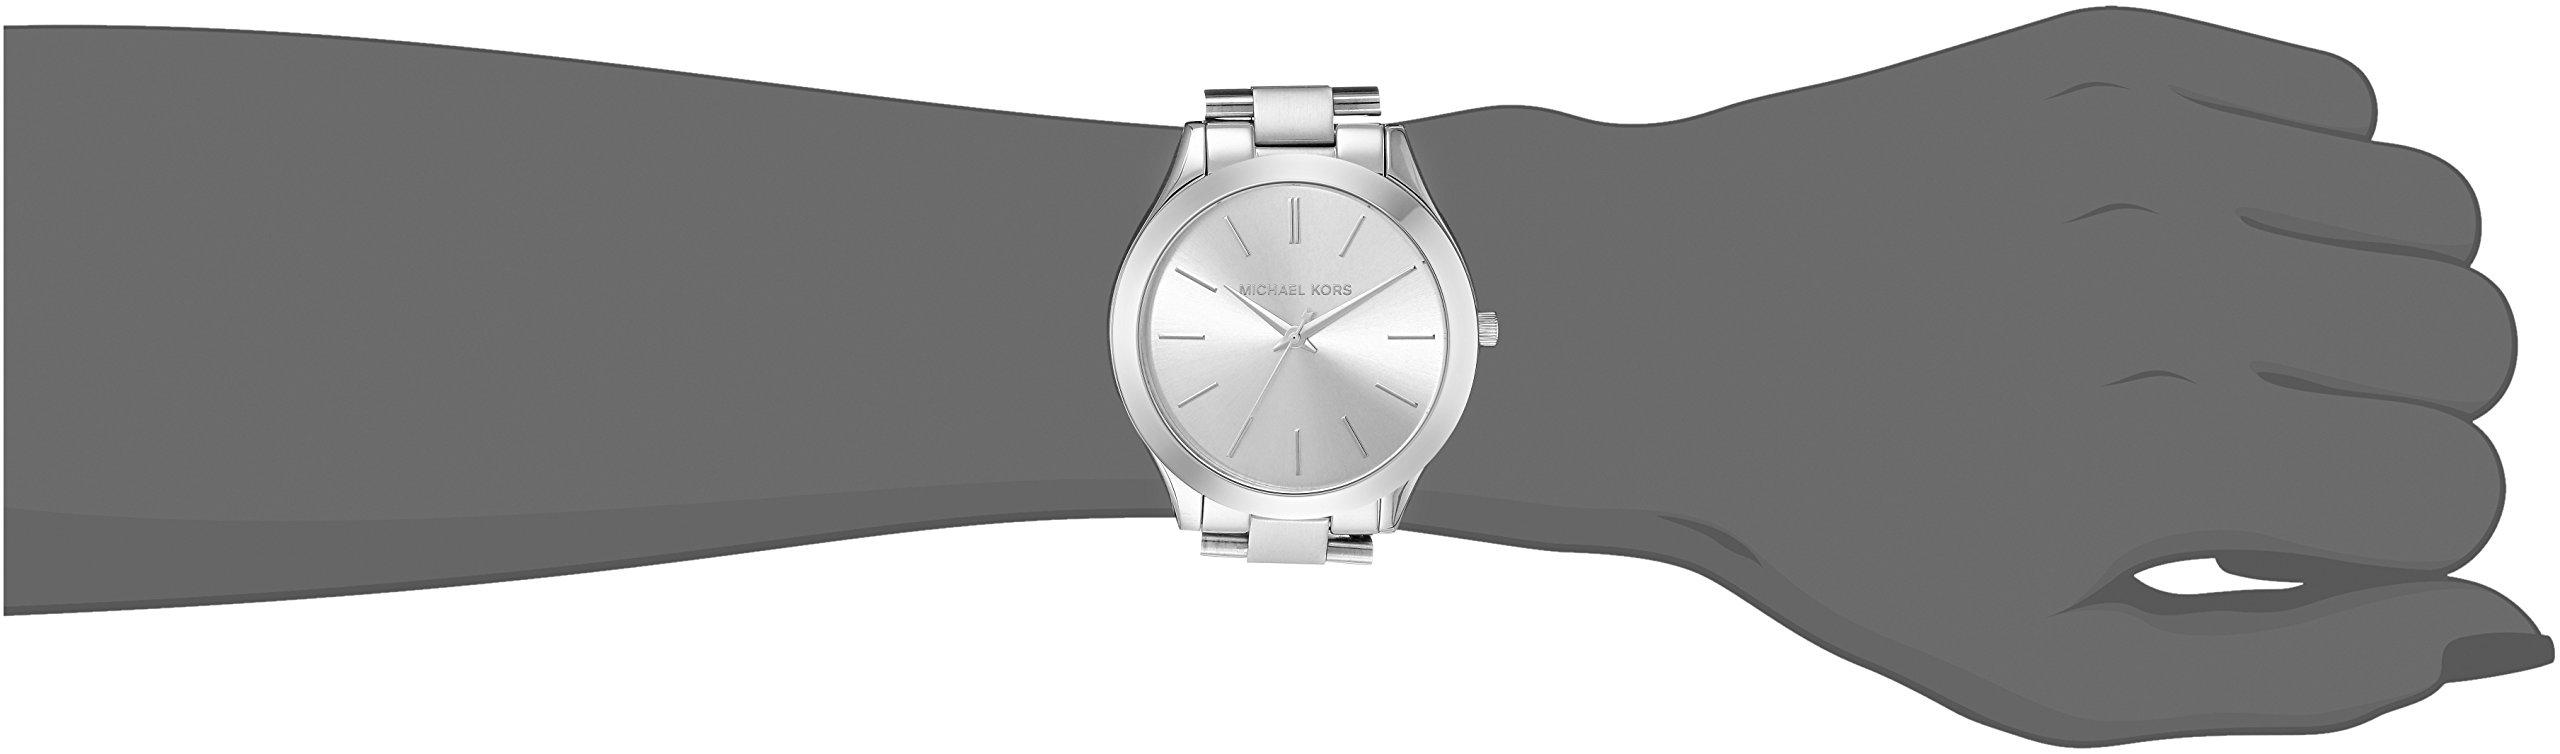 Michael Kors Women's Runway Silver-Tone Watch MK3178 by Michael Kors (Image #3)